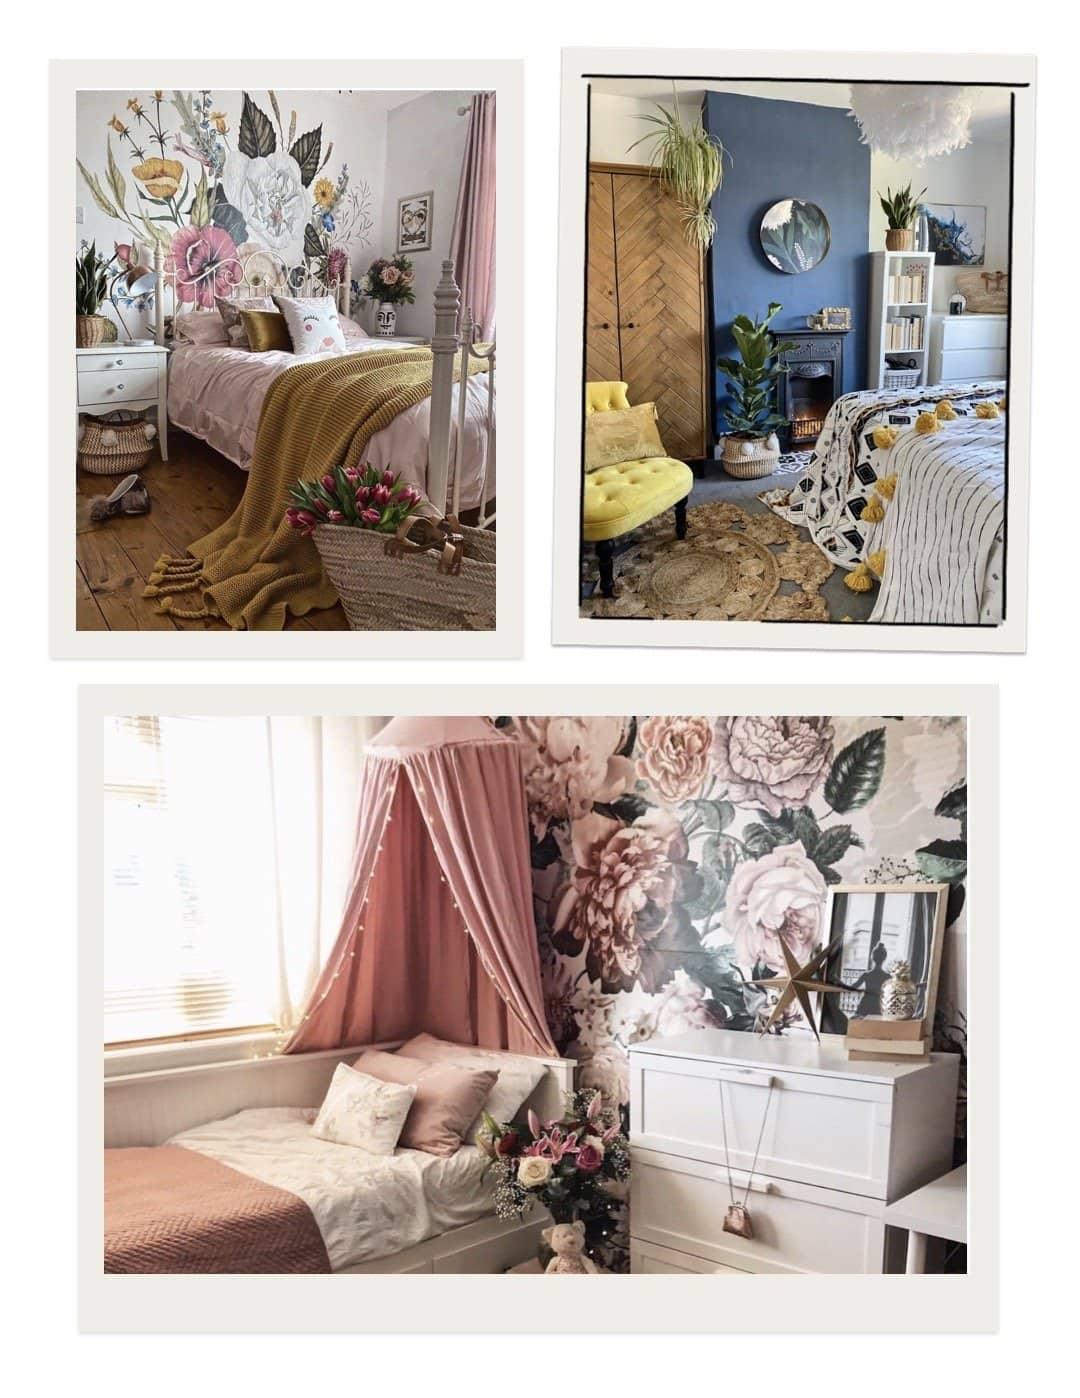 boys, bedroom, boys bedroom, boys decor, bedroom ideas, bedroom decor, jungle, jungle theme, jungle themed room, green, mustard, curtains, furniture, bedroom furniture